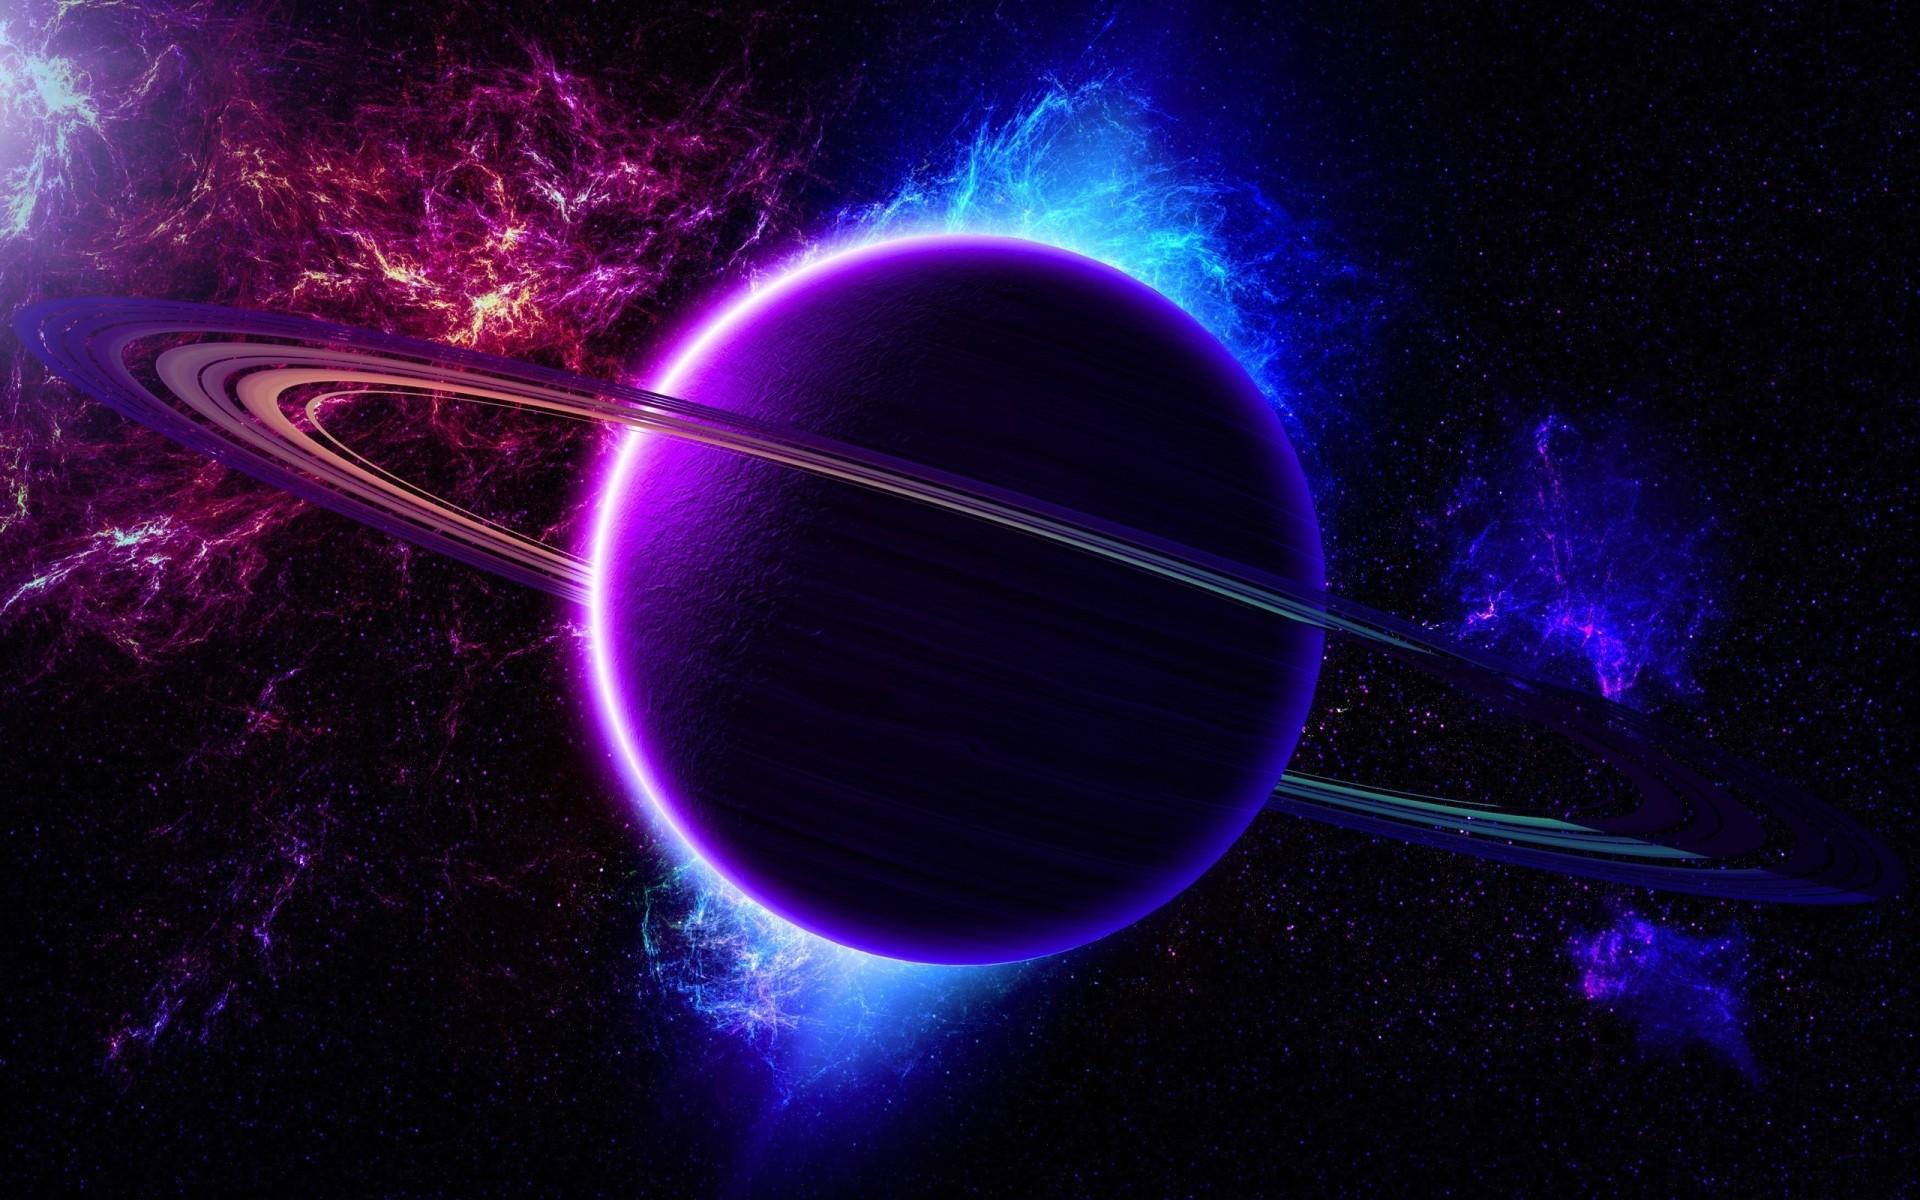 Картинки крутые космос